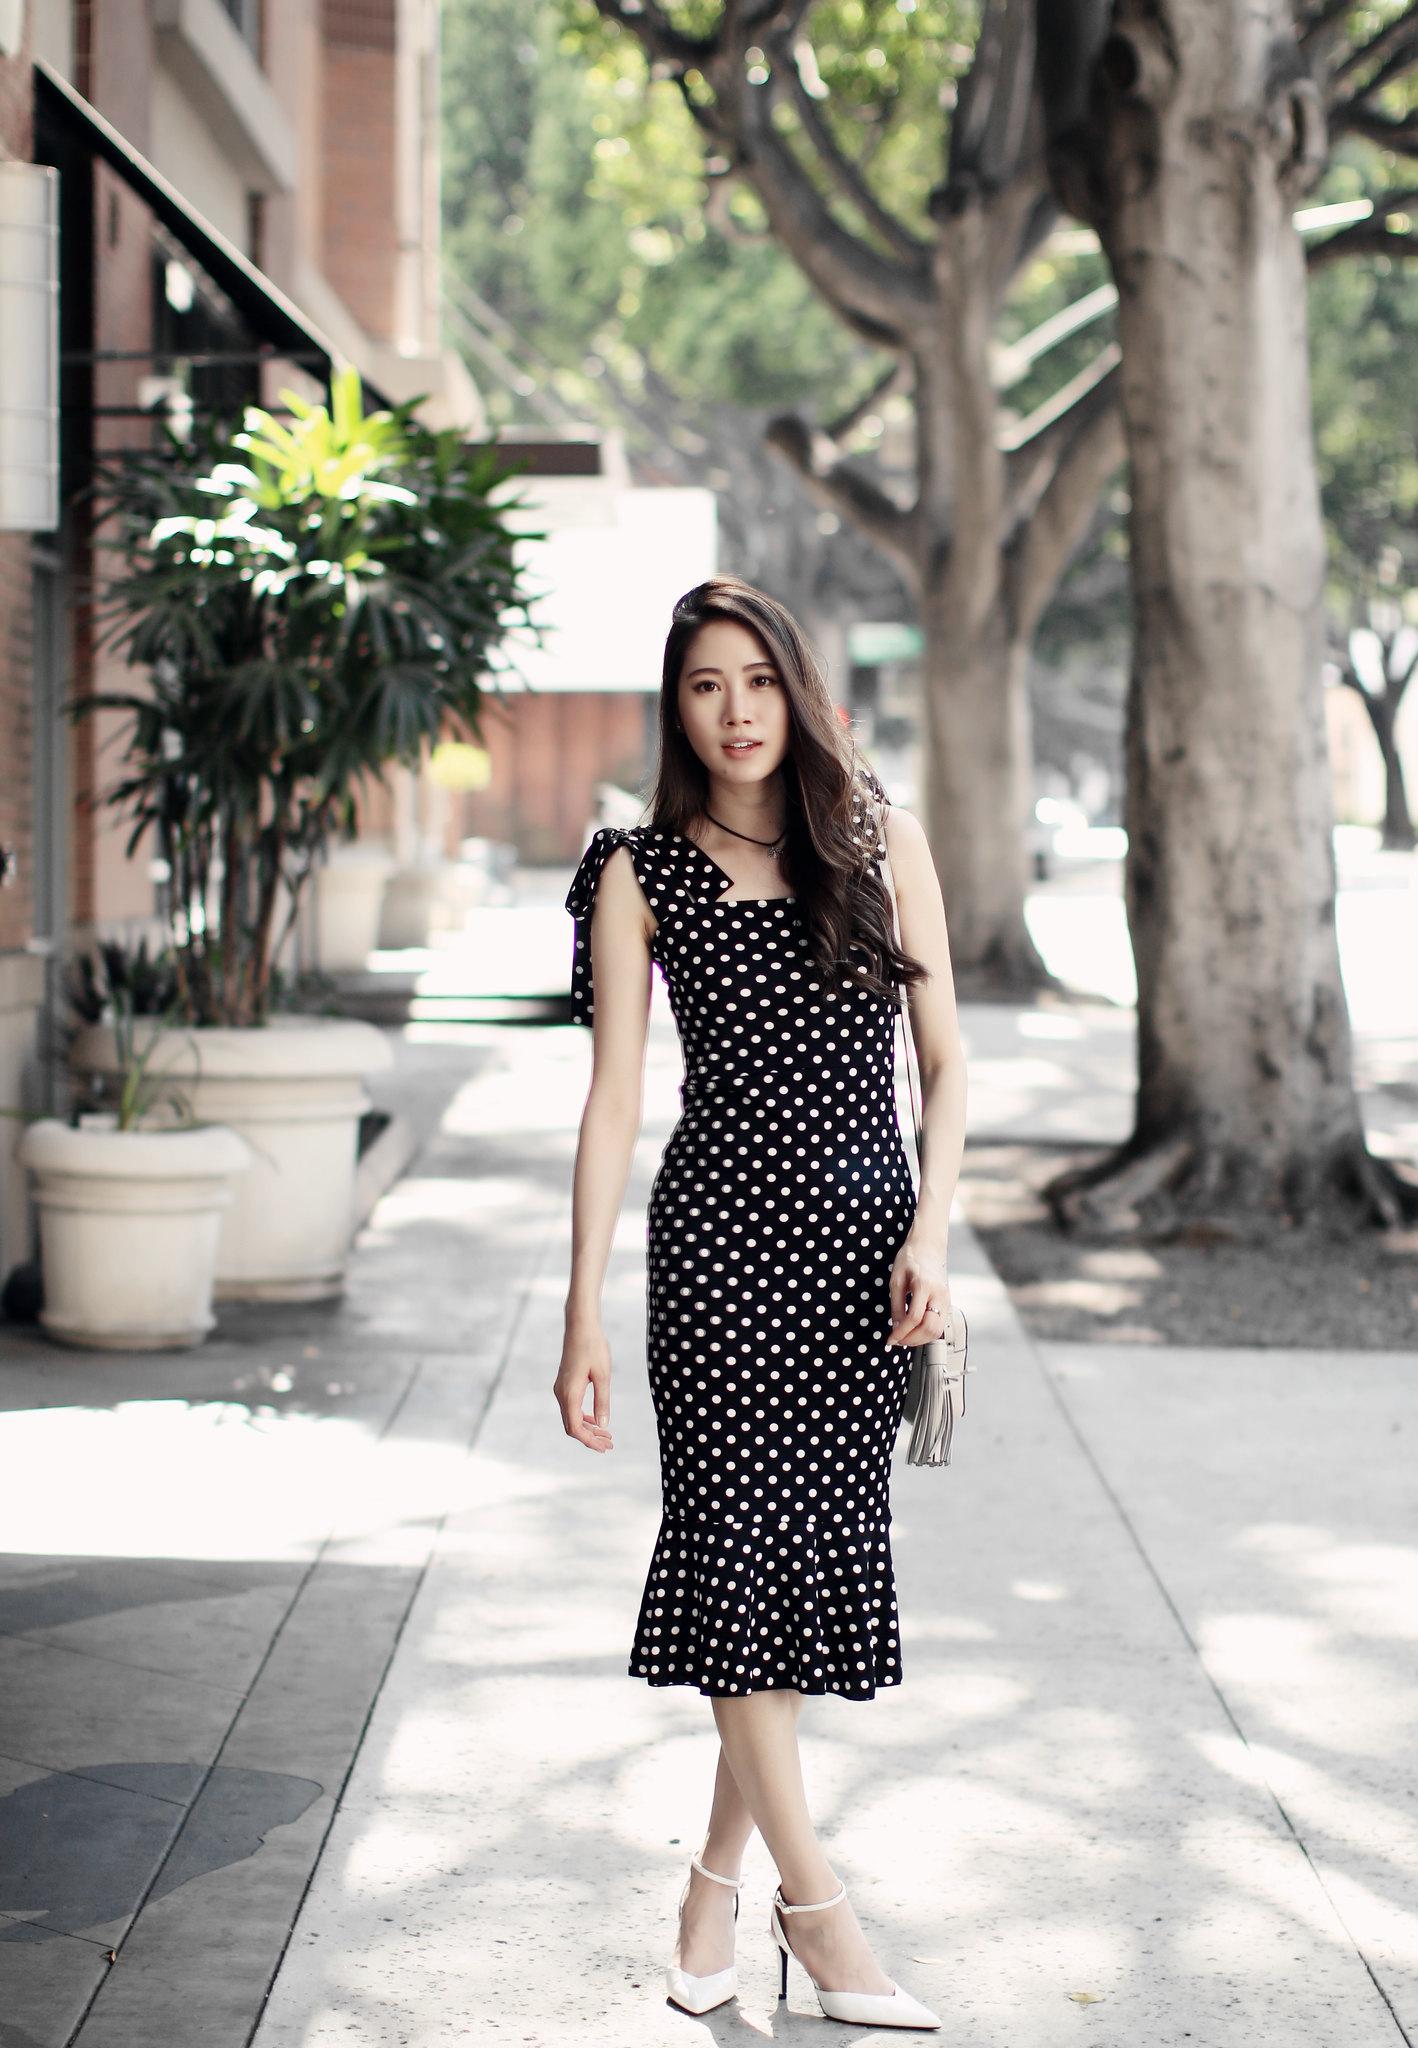 5600-ootd-fashion-style-outfitoftheday-wiwt-streetstyle-sponsored-bershka-shein-sheinofficial-romper-dress-bohochic-summer-elizabeeetht-clothestoyouuu